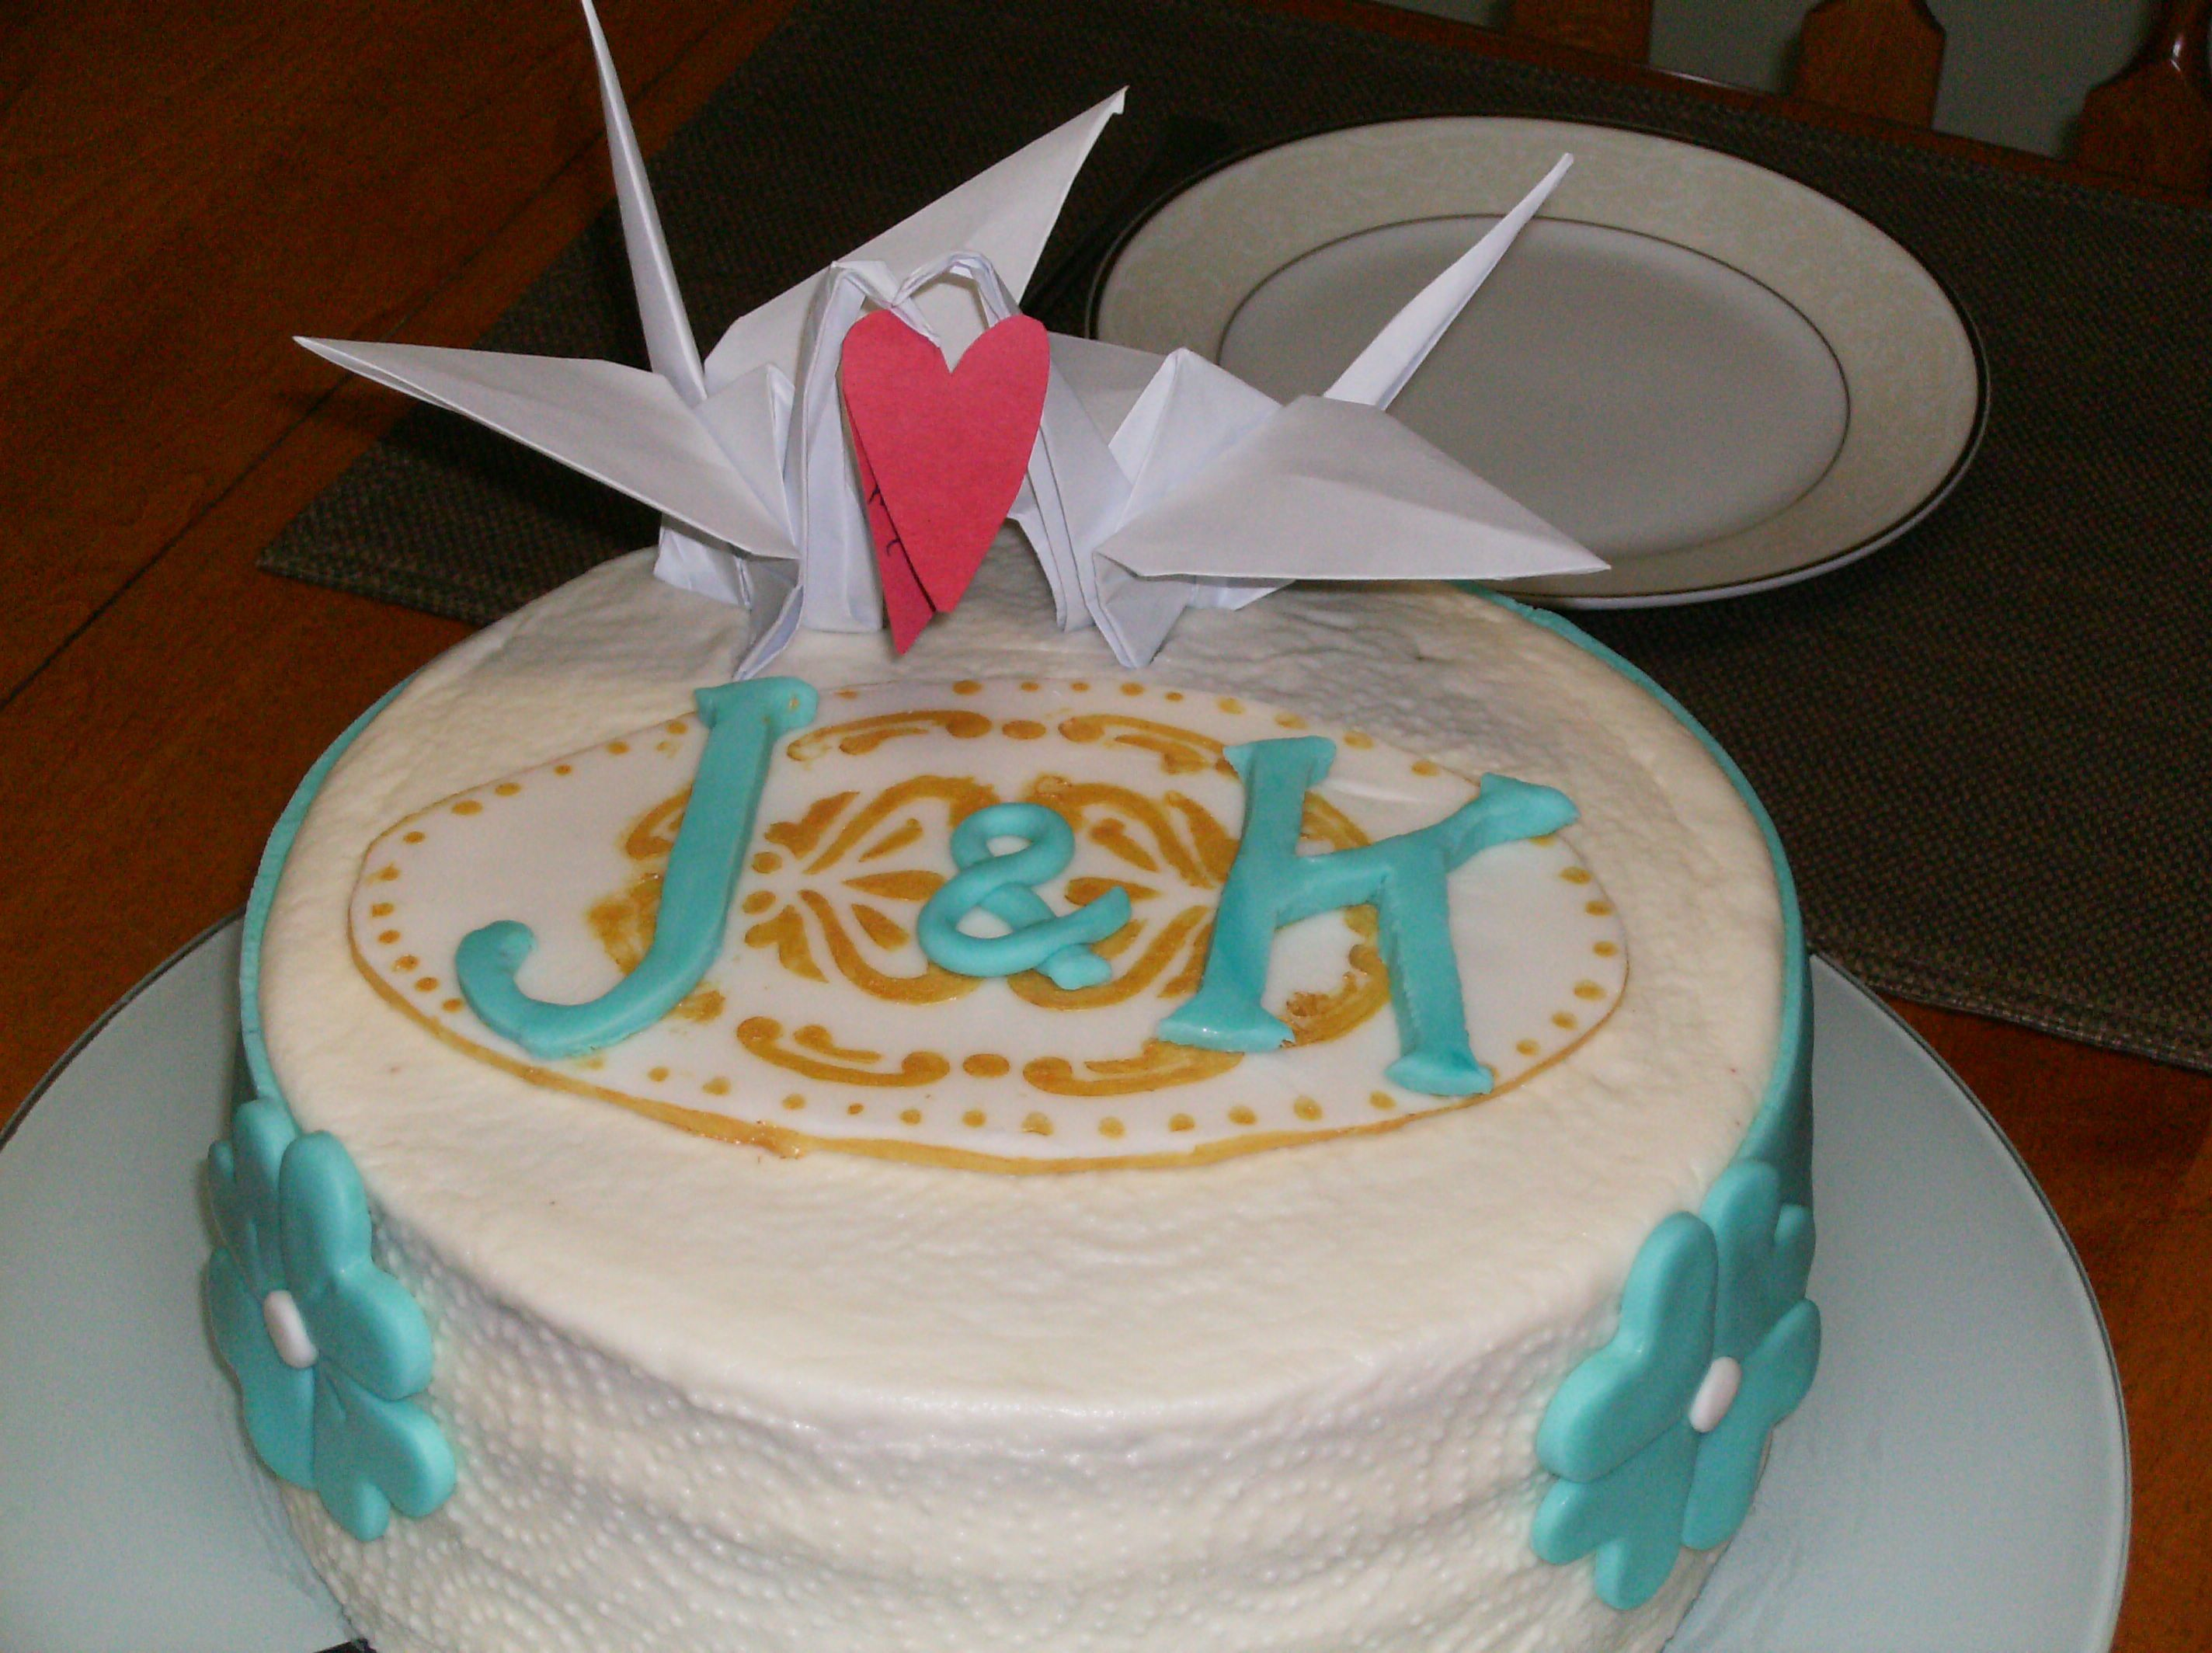 St anniversary paper cake favorite recipes pinterest paper